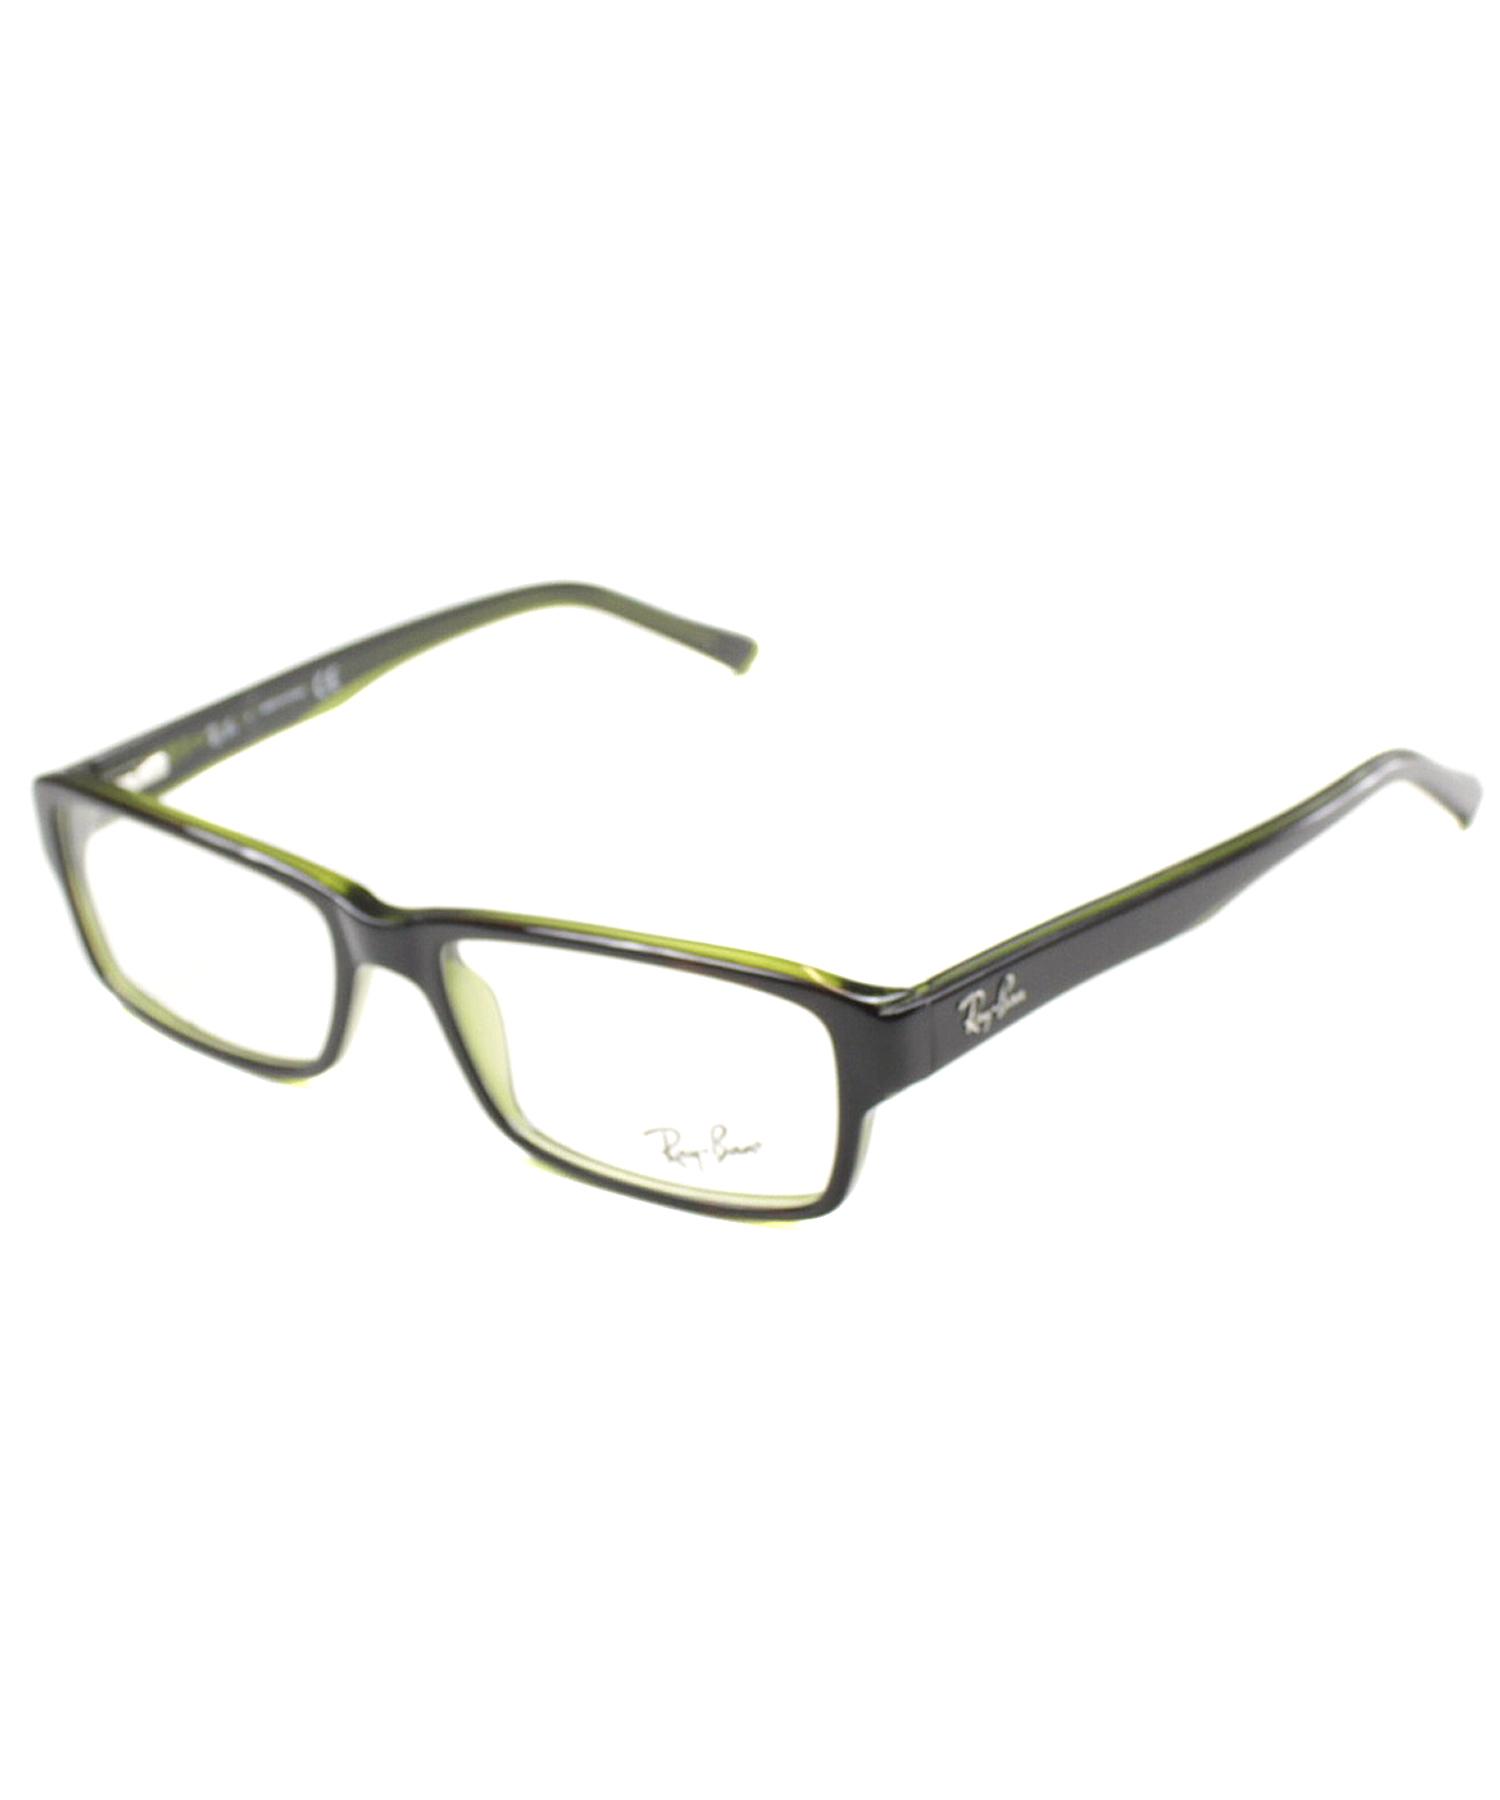 Rectangular Shaped Eyeglass Frames  David Simchi-Levi-6185